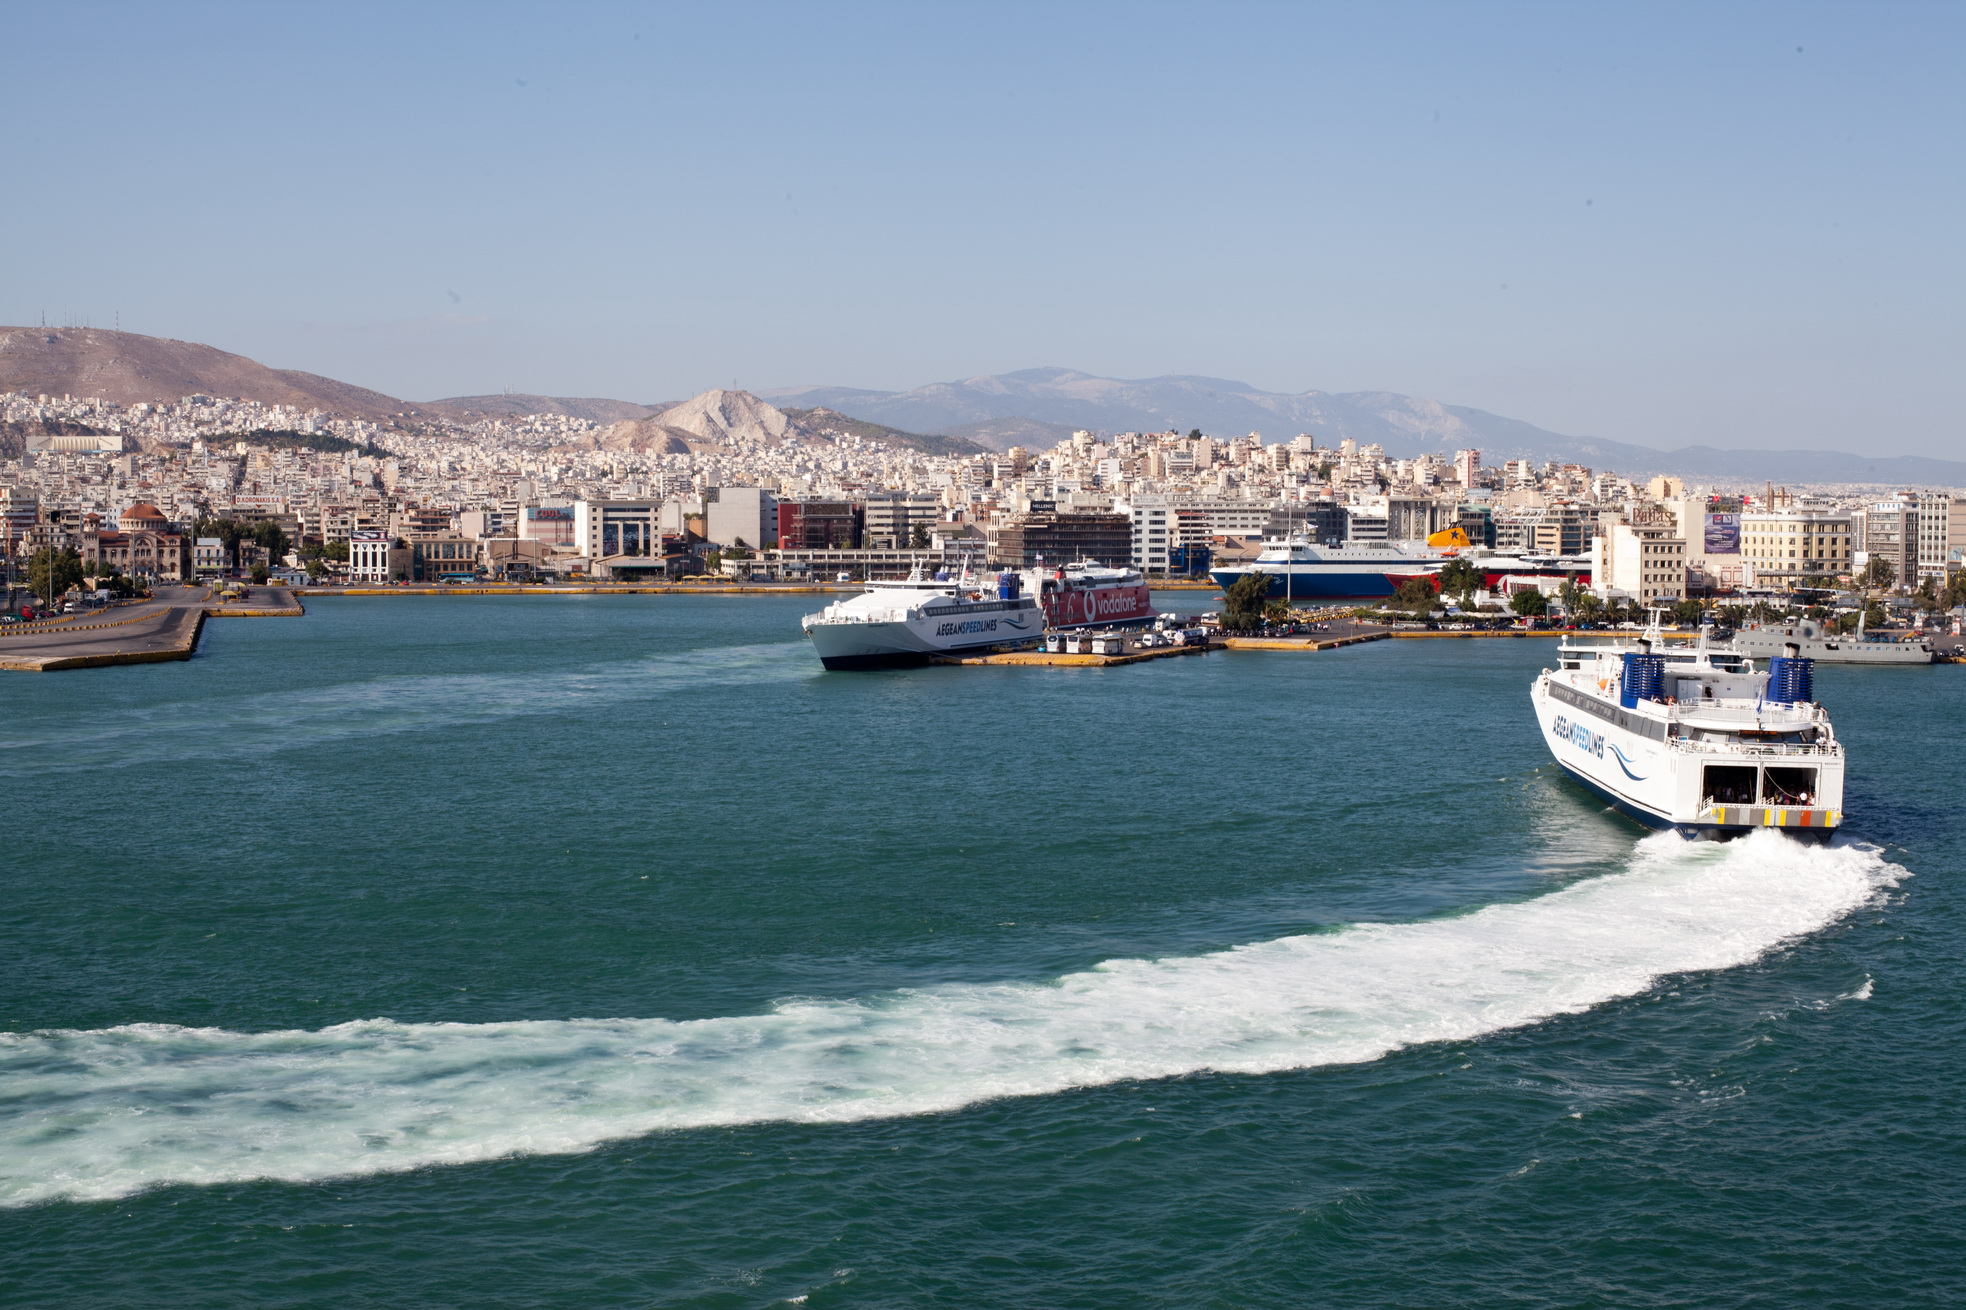 MS Speedrunner III IMO 9141871 Aegean Speed Lines entering Piraeus Port of Athens Greece 05